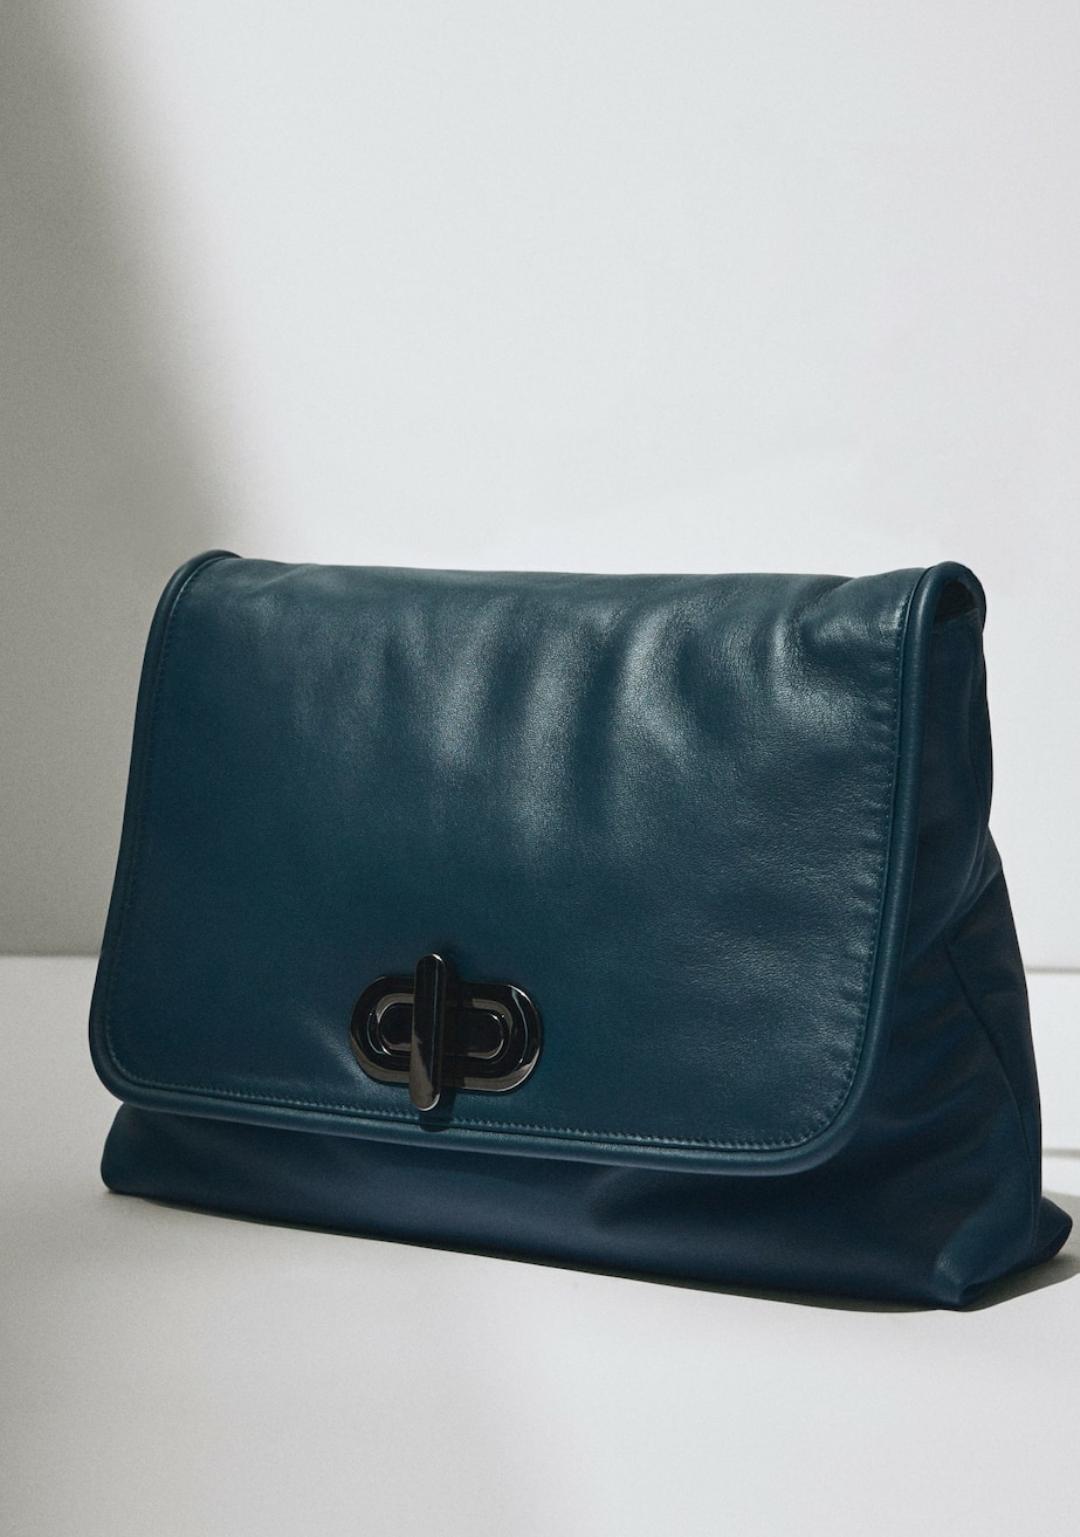 Bolso Pouch de piel Limited Edition en color azul, de Massimo Dutti